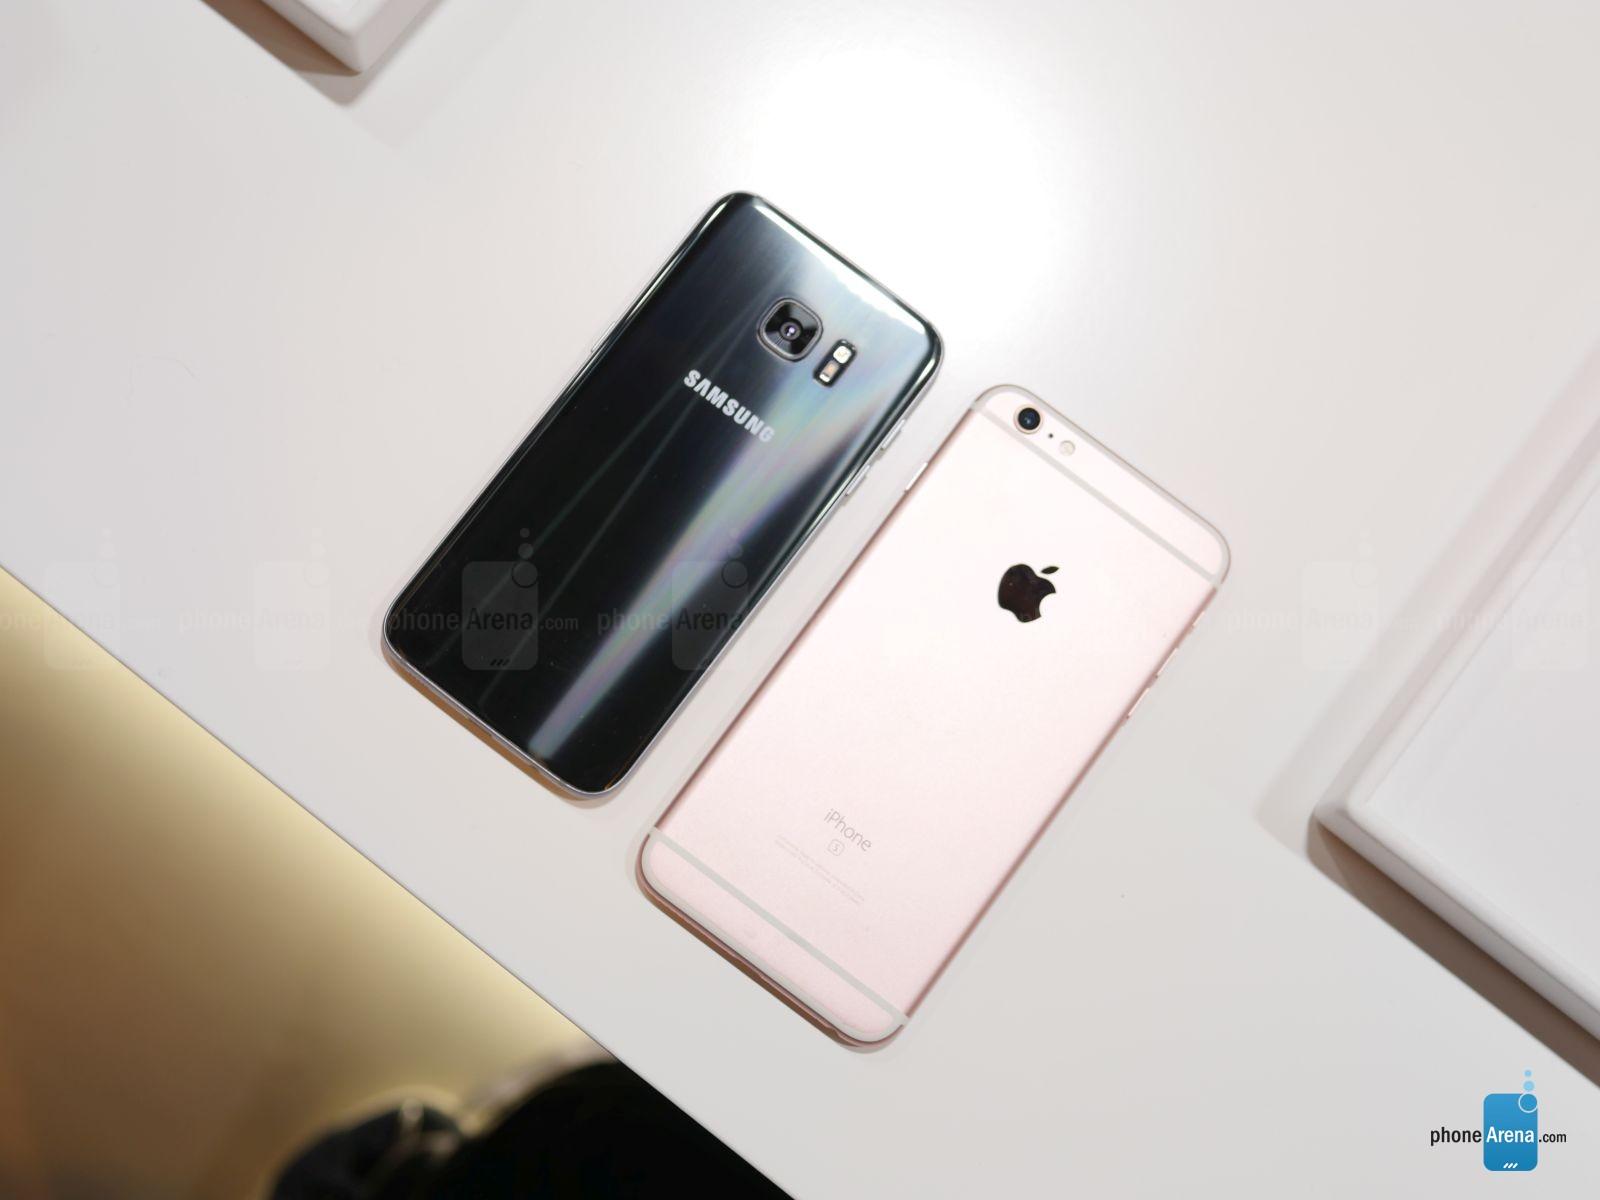 Samsung-Galaxy-S7-edge-vs-Apple-iPhoлдлne-6s-Plus